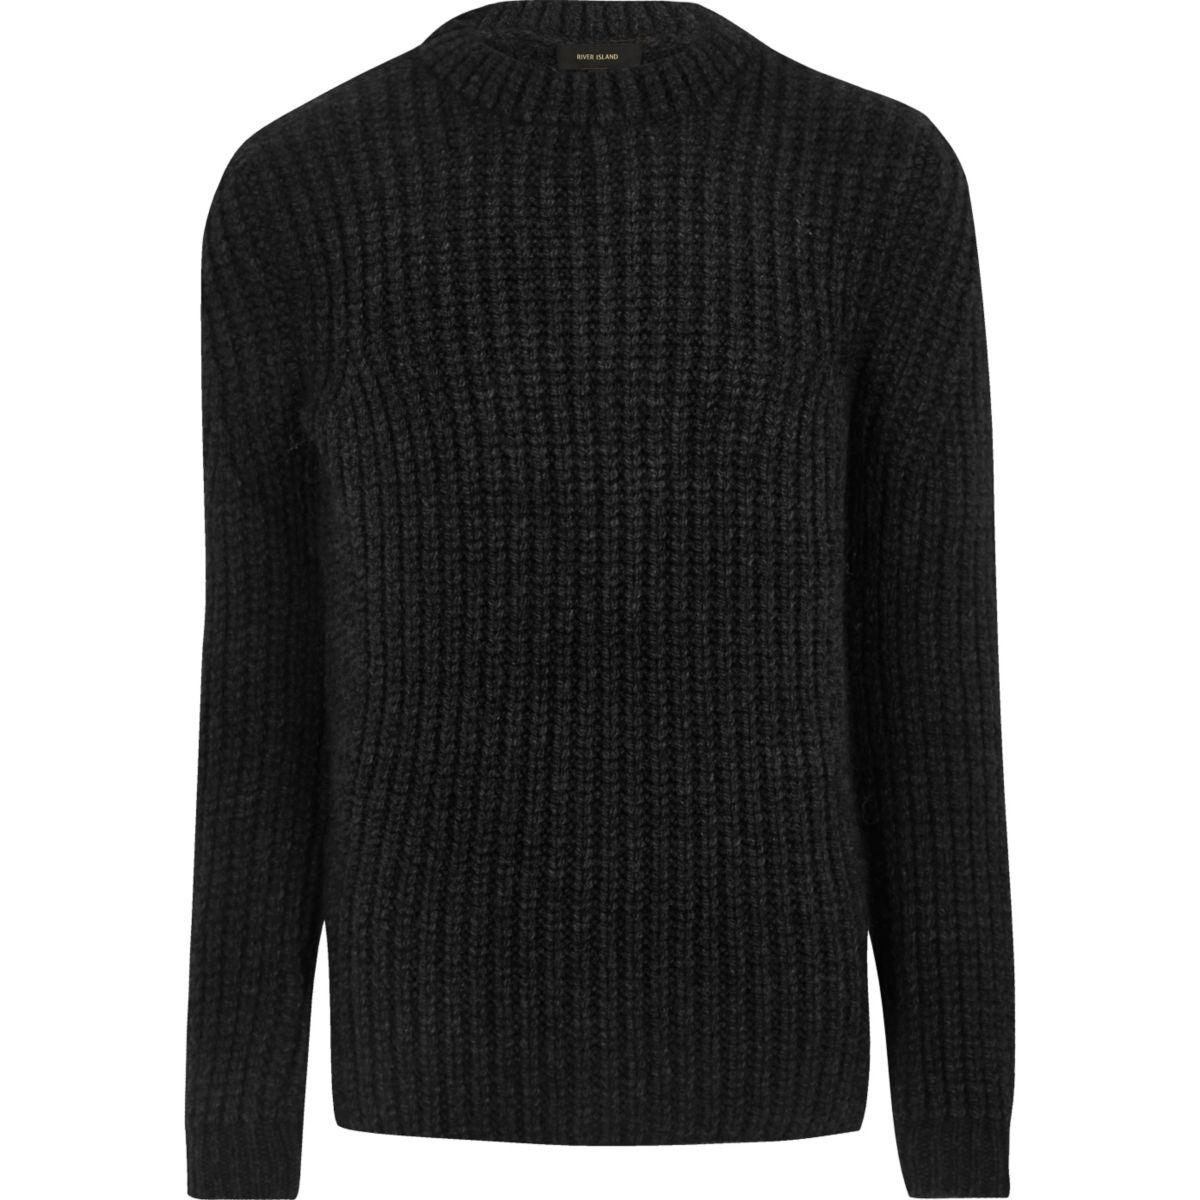 Dark grey chunky knit jumper